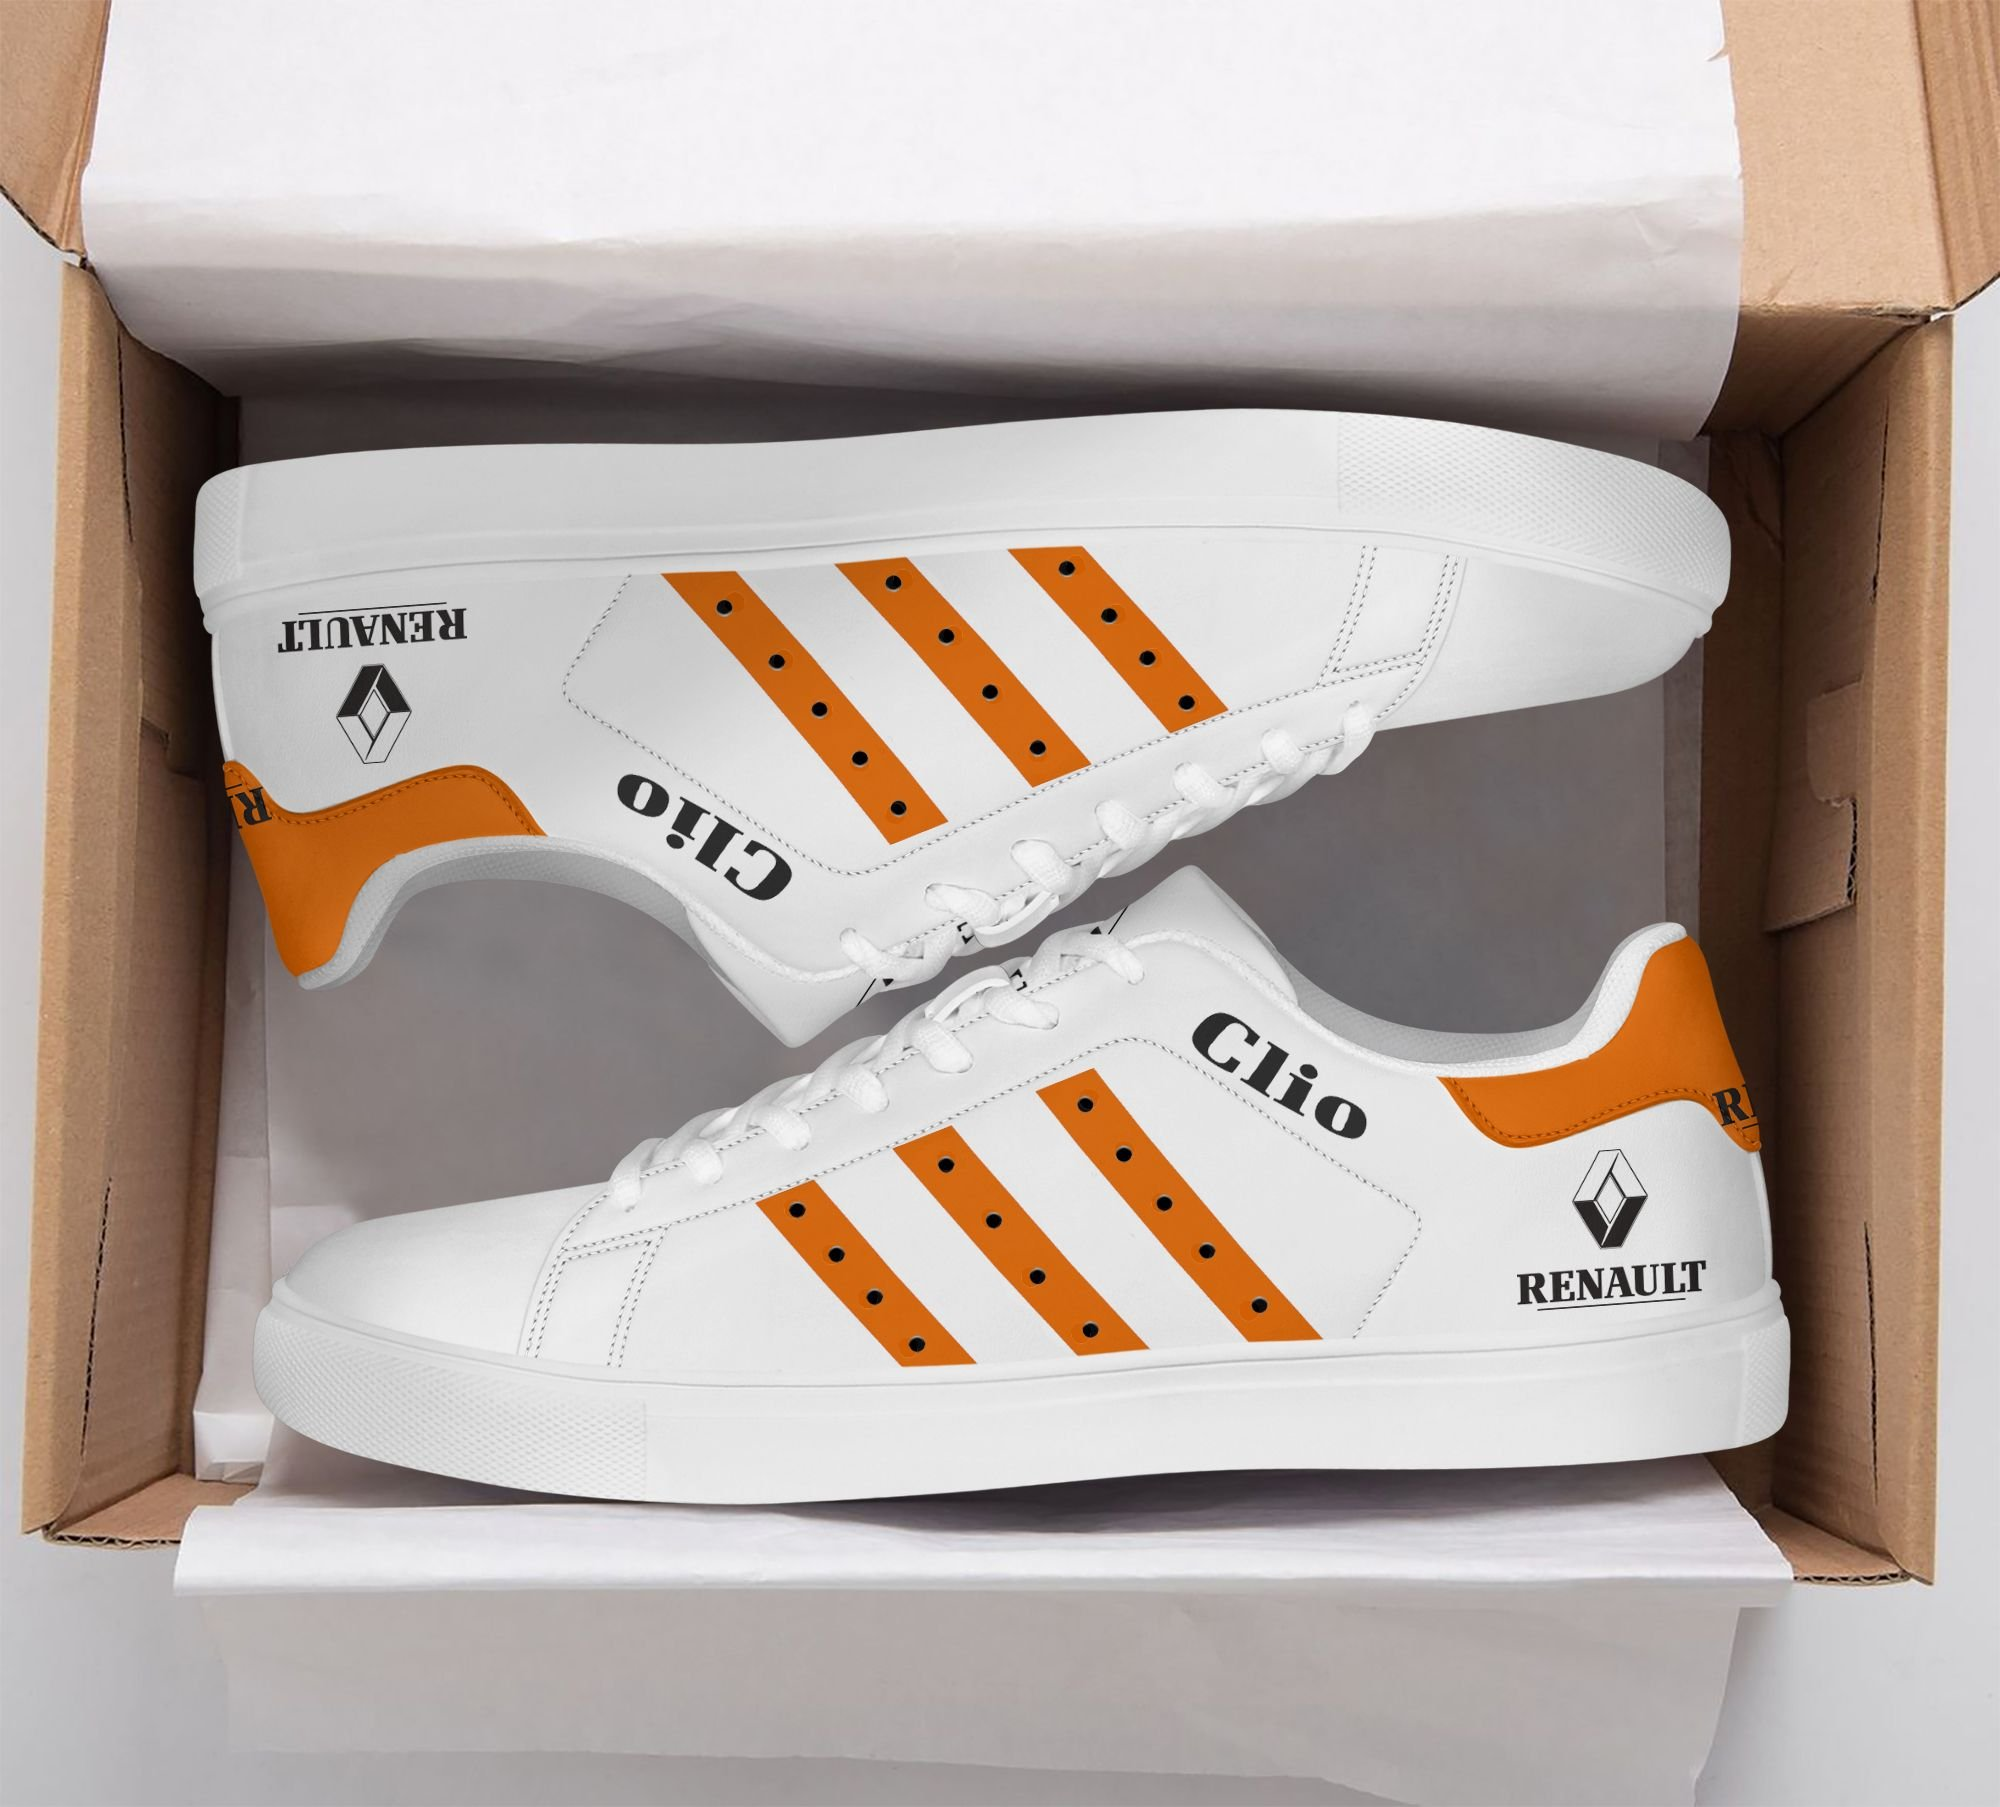 Renault Clio orange line Stan Smith Shoes